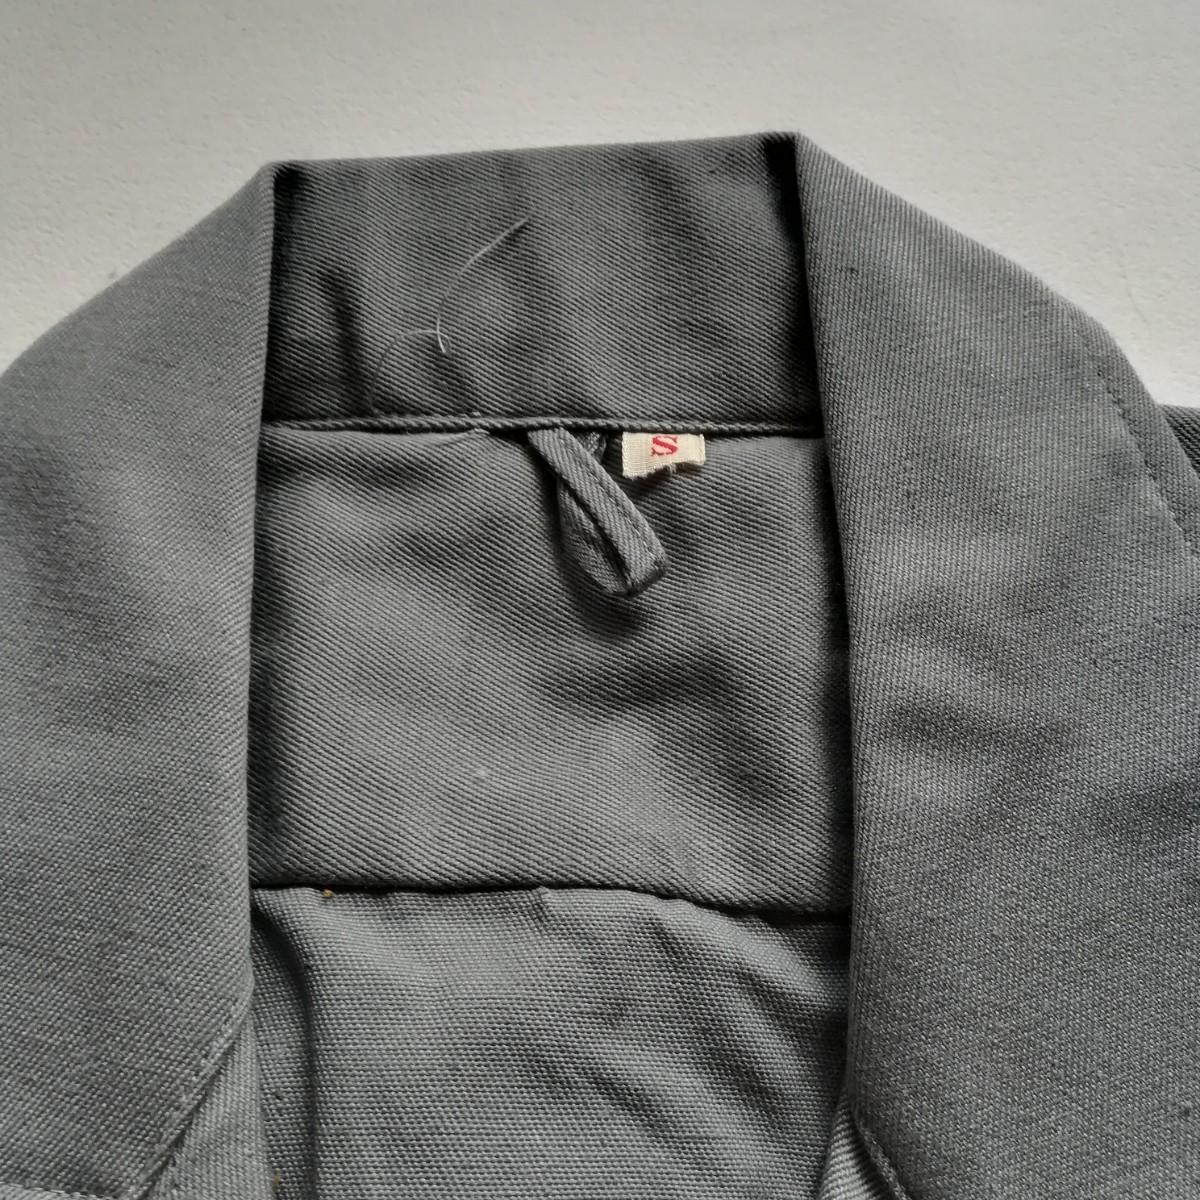 国鉄 制服 半袖 グレー